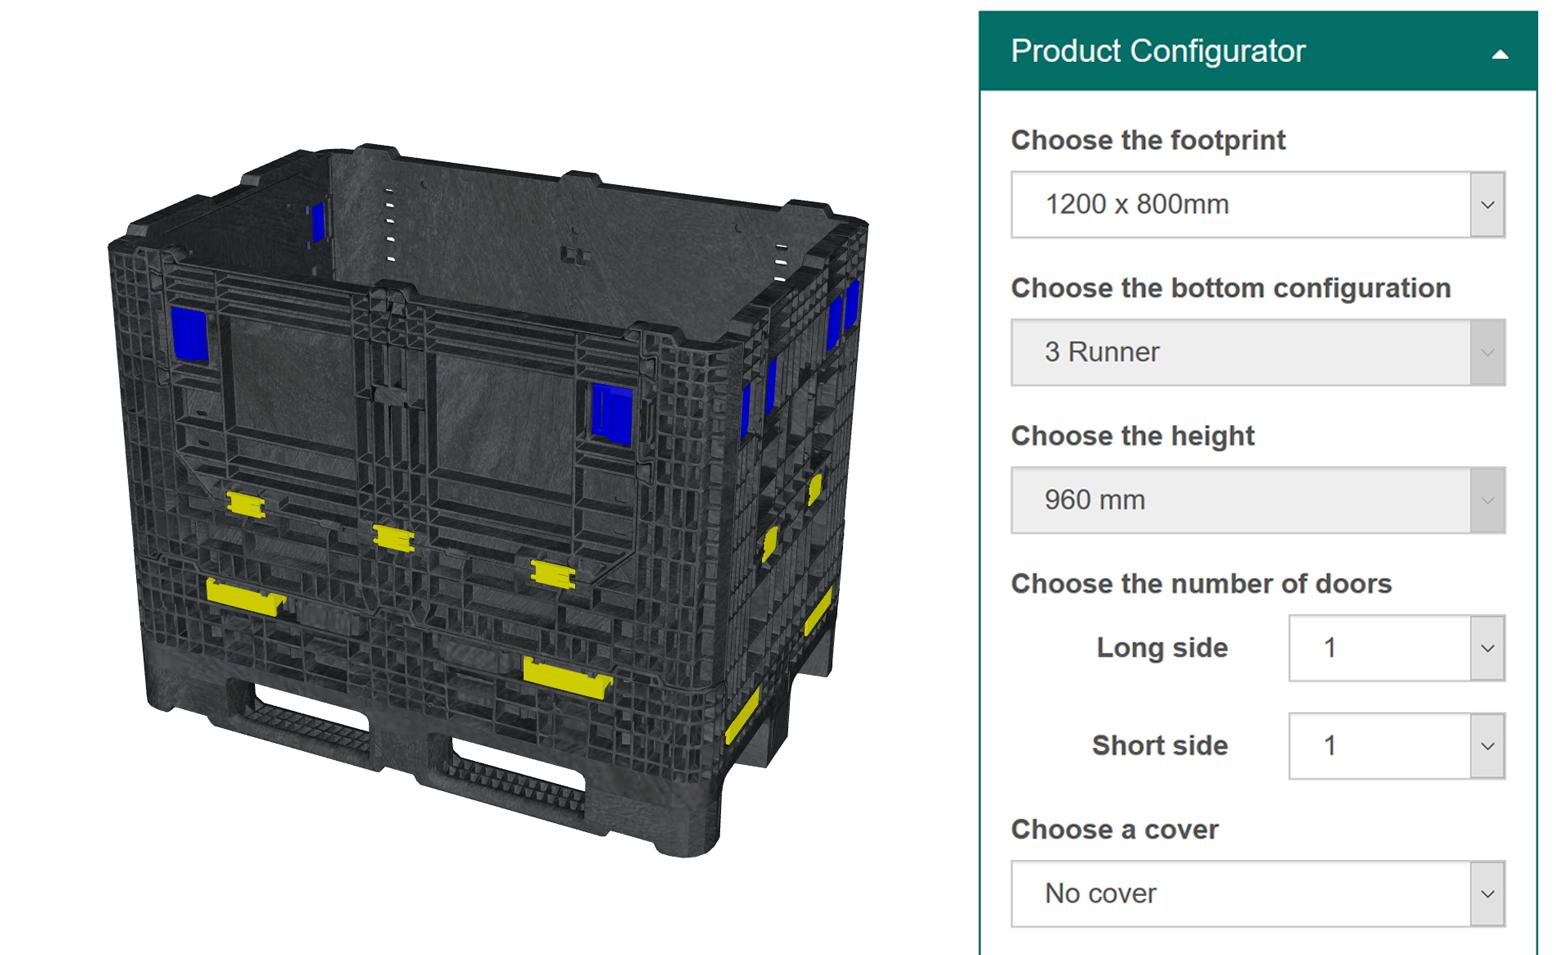 Transportverpackungen und faltbare Großladungsträger aus Kunststoff: Produktkonfigurator